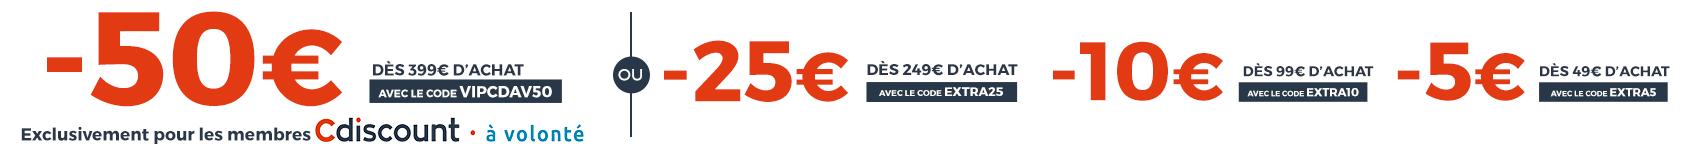 http://i2.cdscdn.com/other/pav-bandeau-hautslider-1700x150_170414113105.png